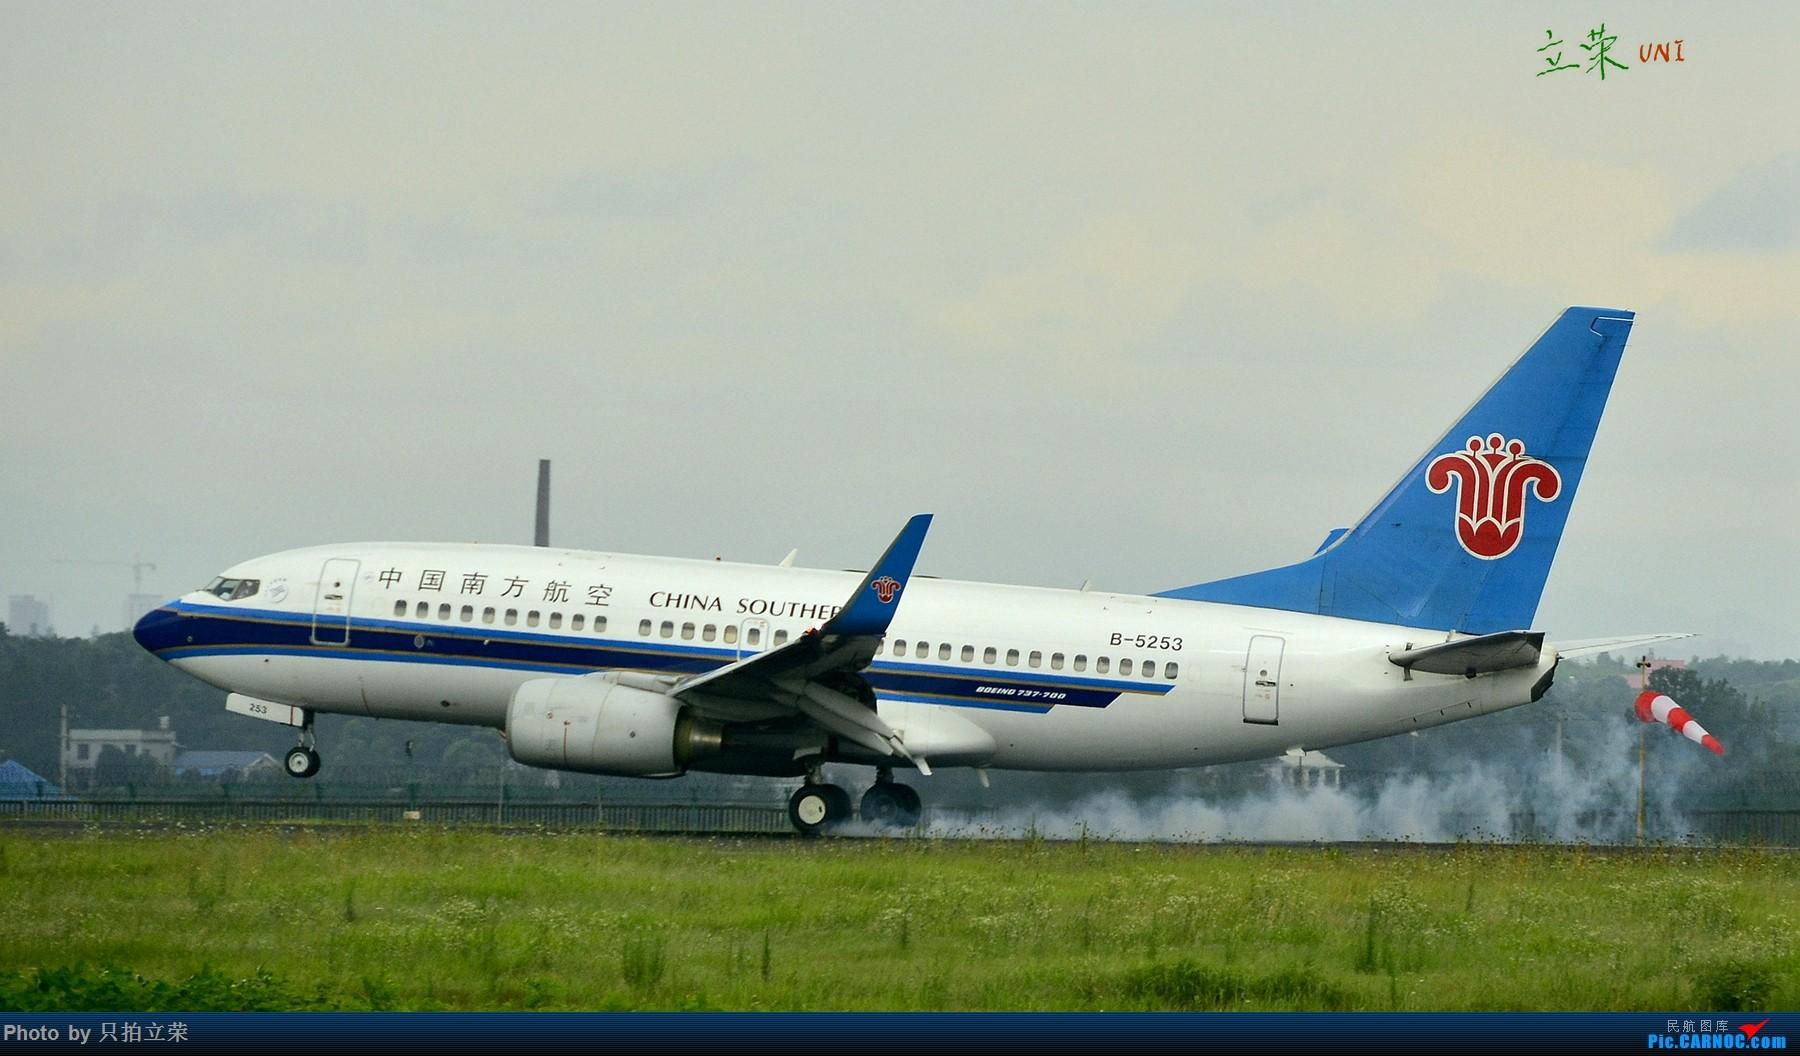 Re:[原创]长沙黄花机场73G/737-700擦烟小集锦 BOEING 737-700 B-5253 中国长沙黄花国际机场